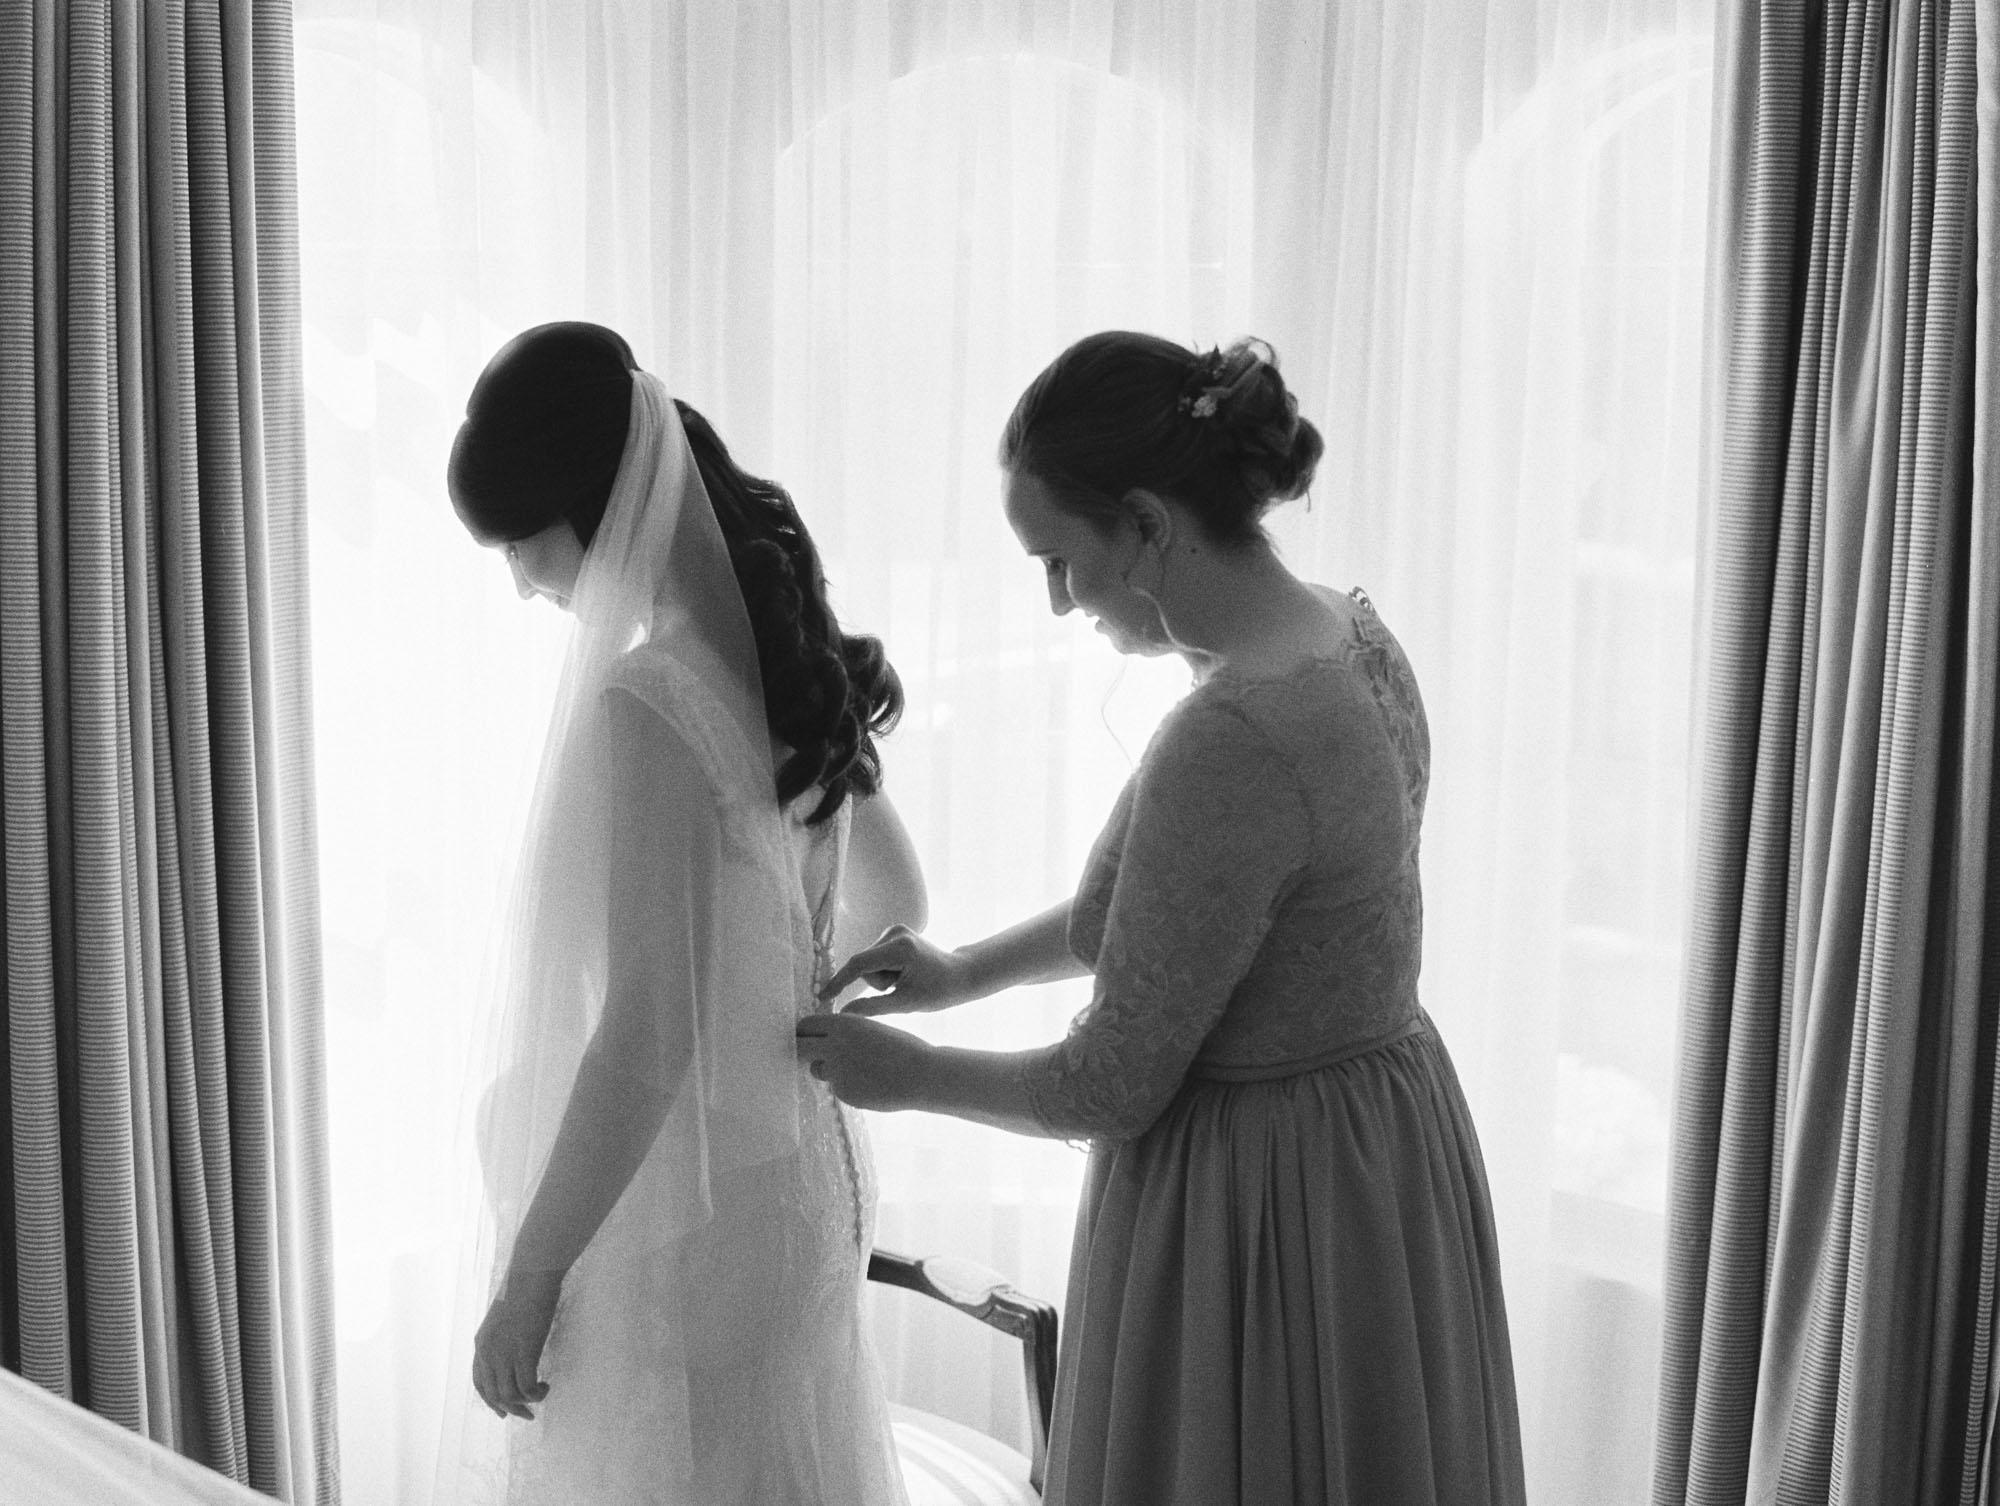 Glen-Ewin-Estate-wedding-photography-020.jpg